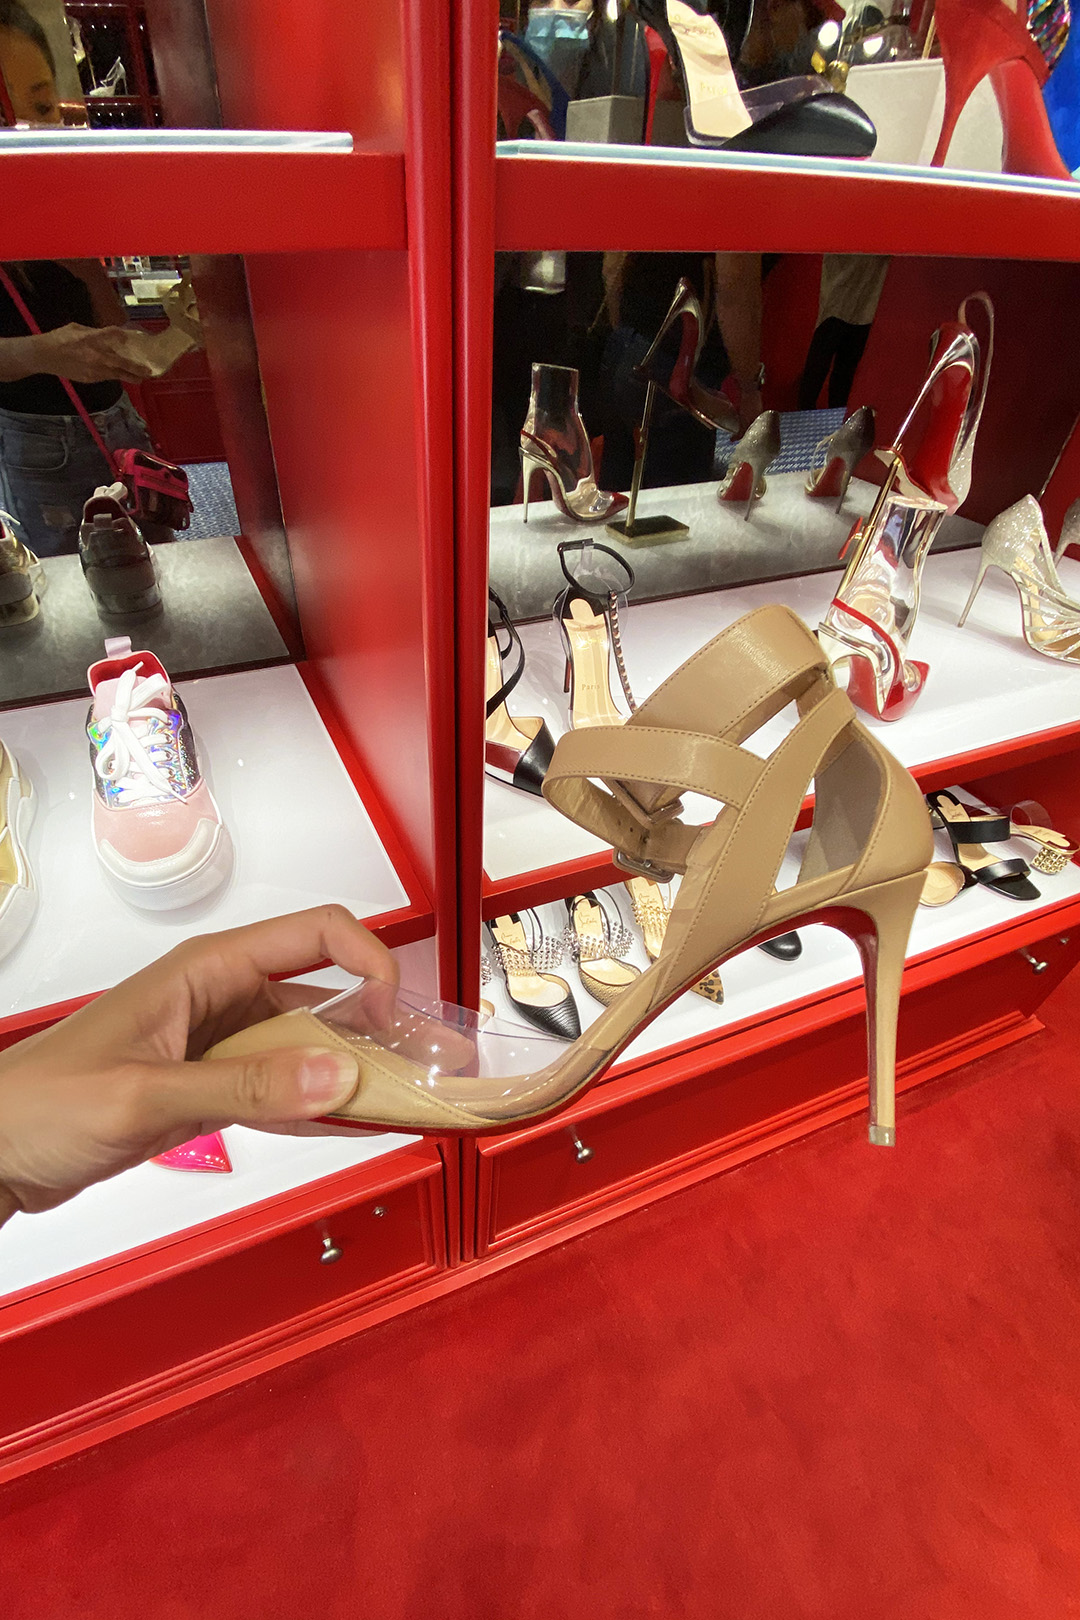 Christian Louboutin Outlet Women's Heels (The Luxury Lowdown Blog)